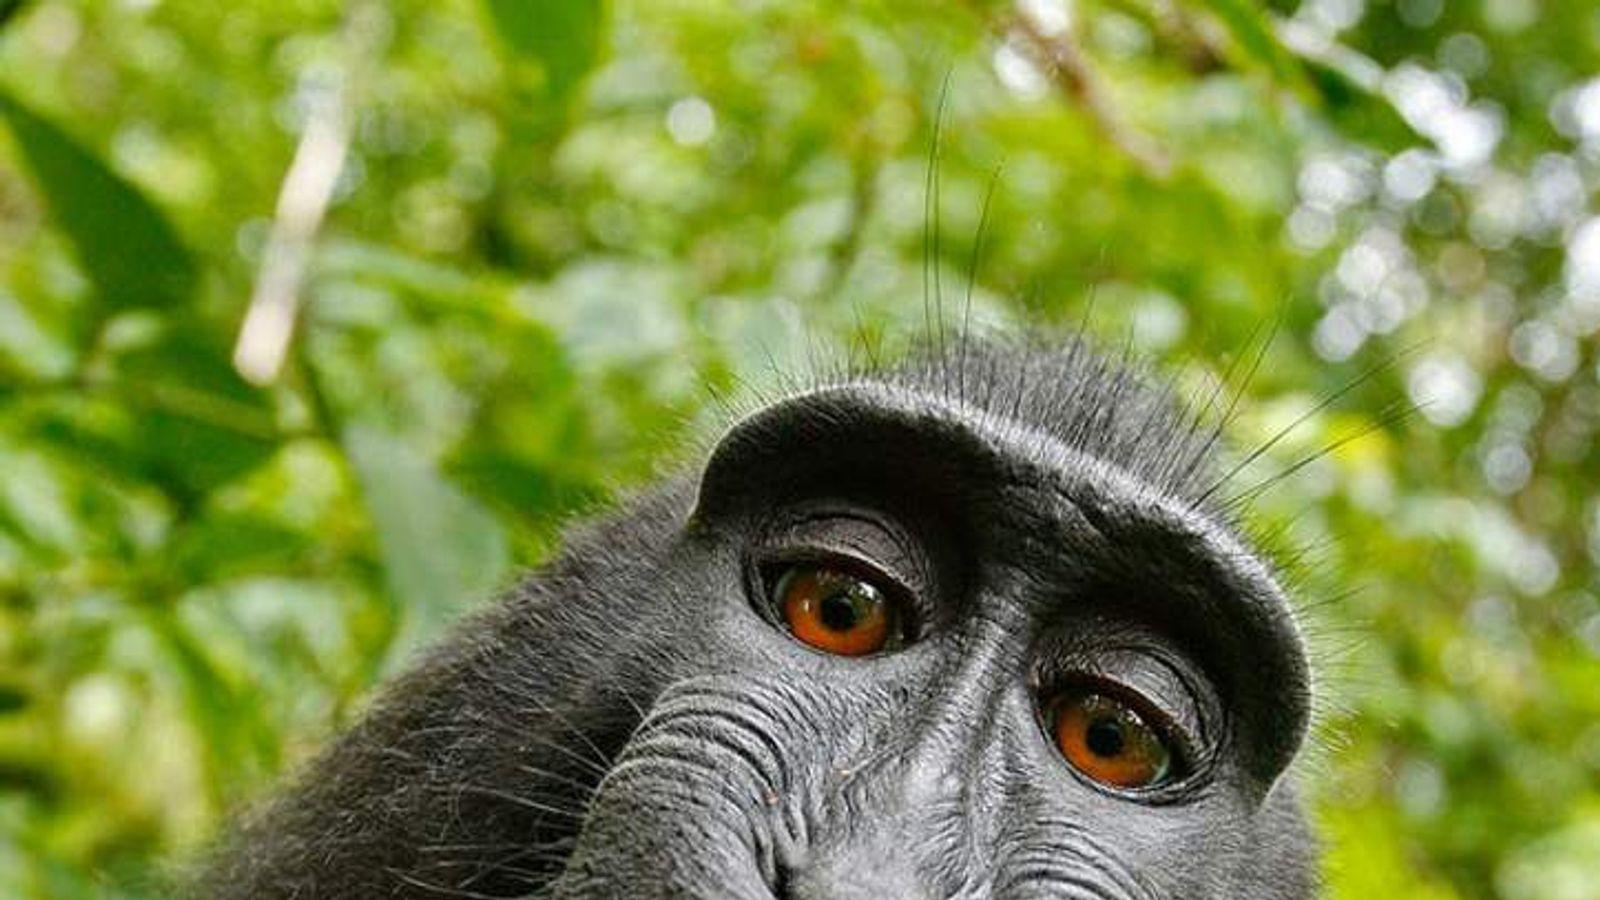 Macaque selfie using photographer David Slater's camera